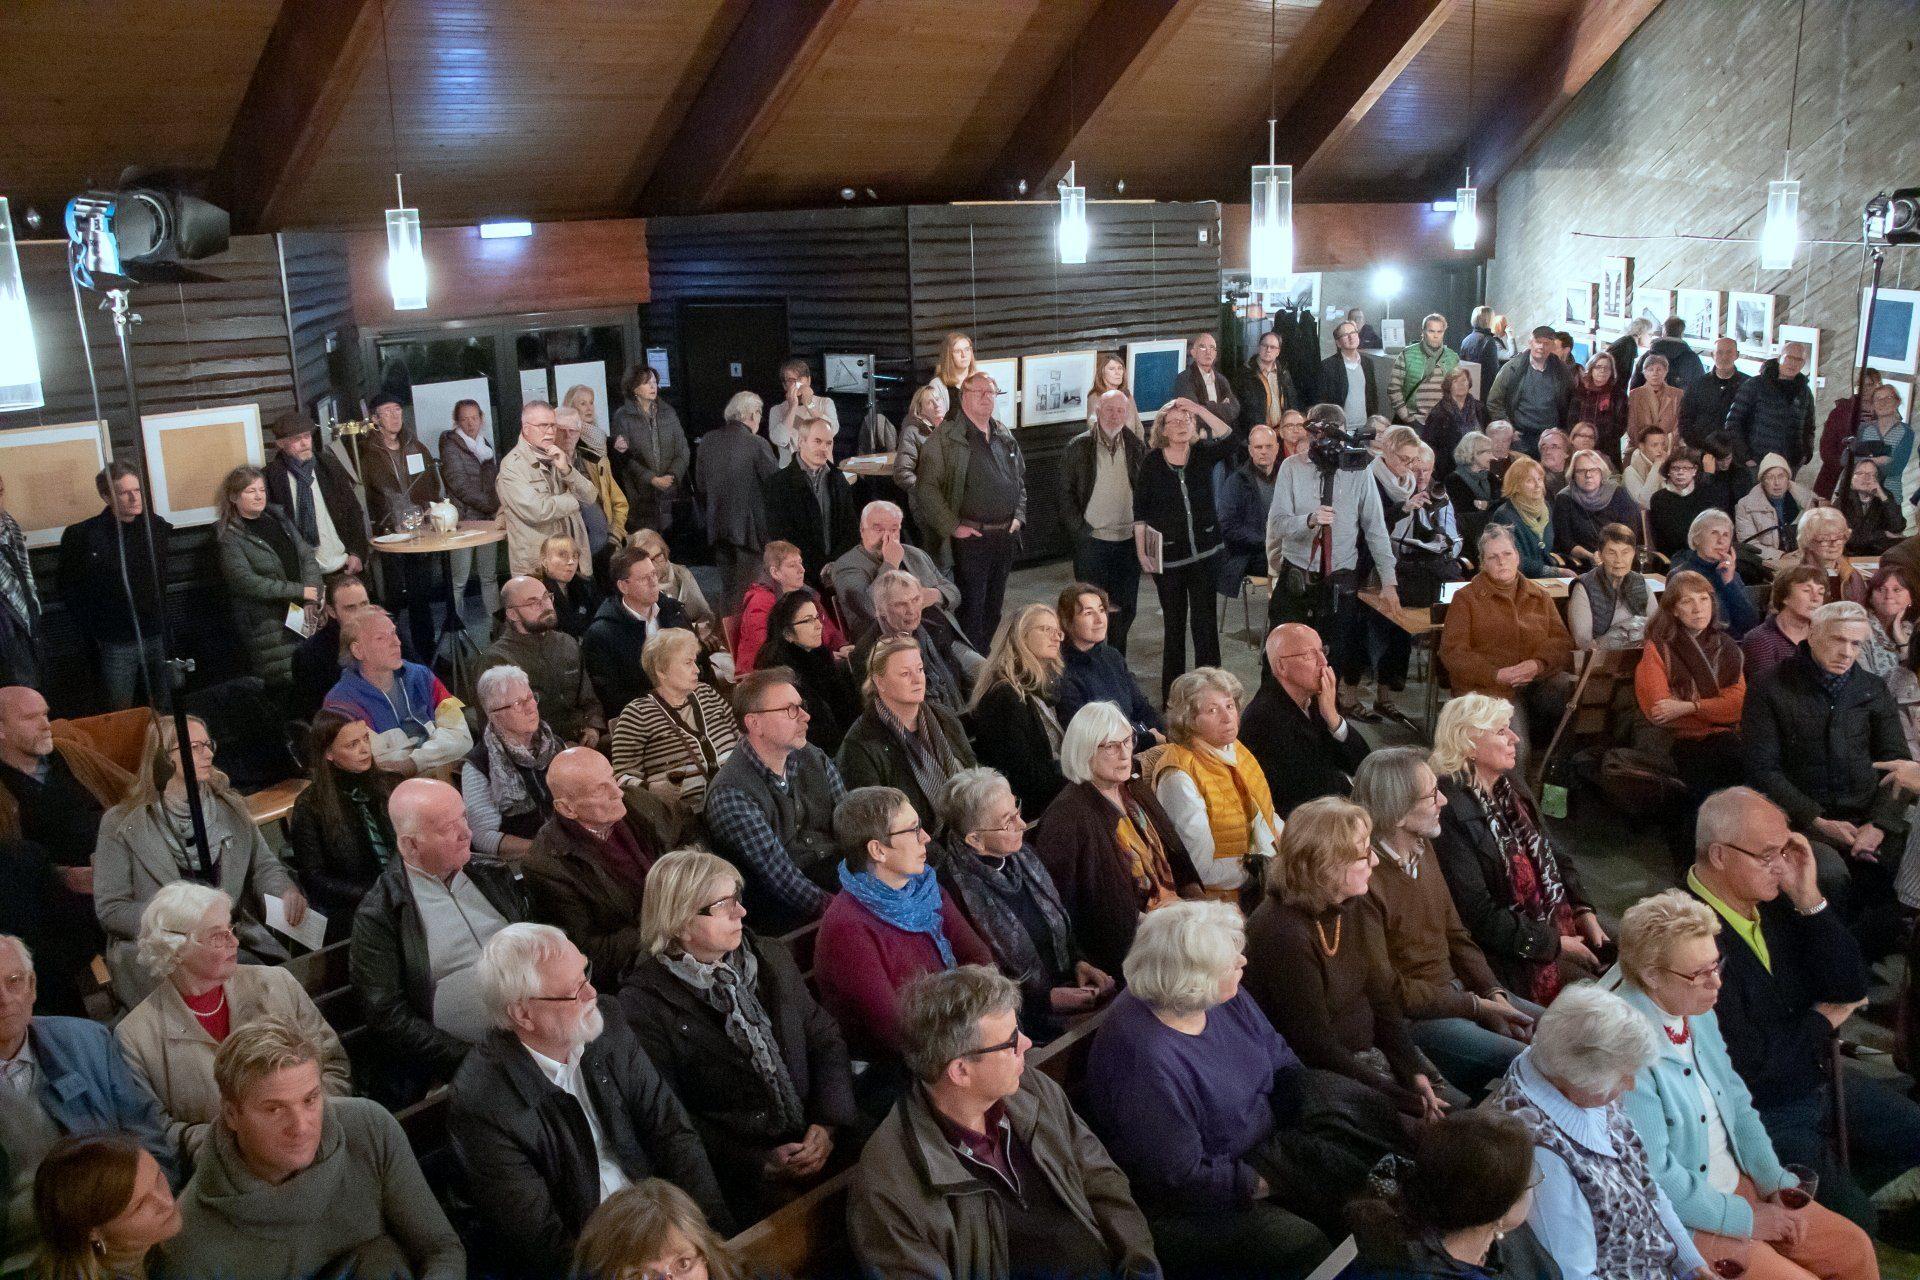 wilhelm riphahn ute fendel Six8tyOne Big Band kulturkirche ost köln GAG